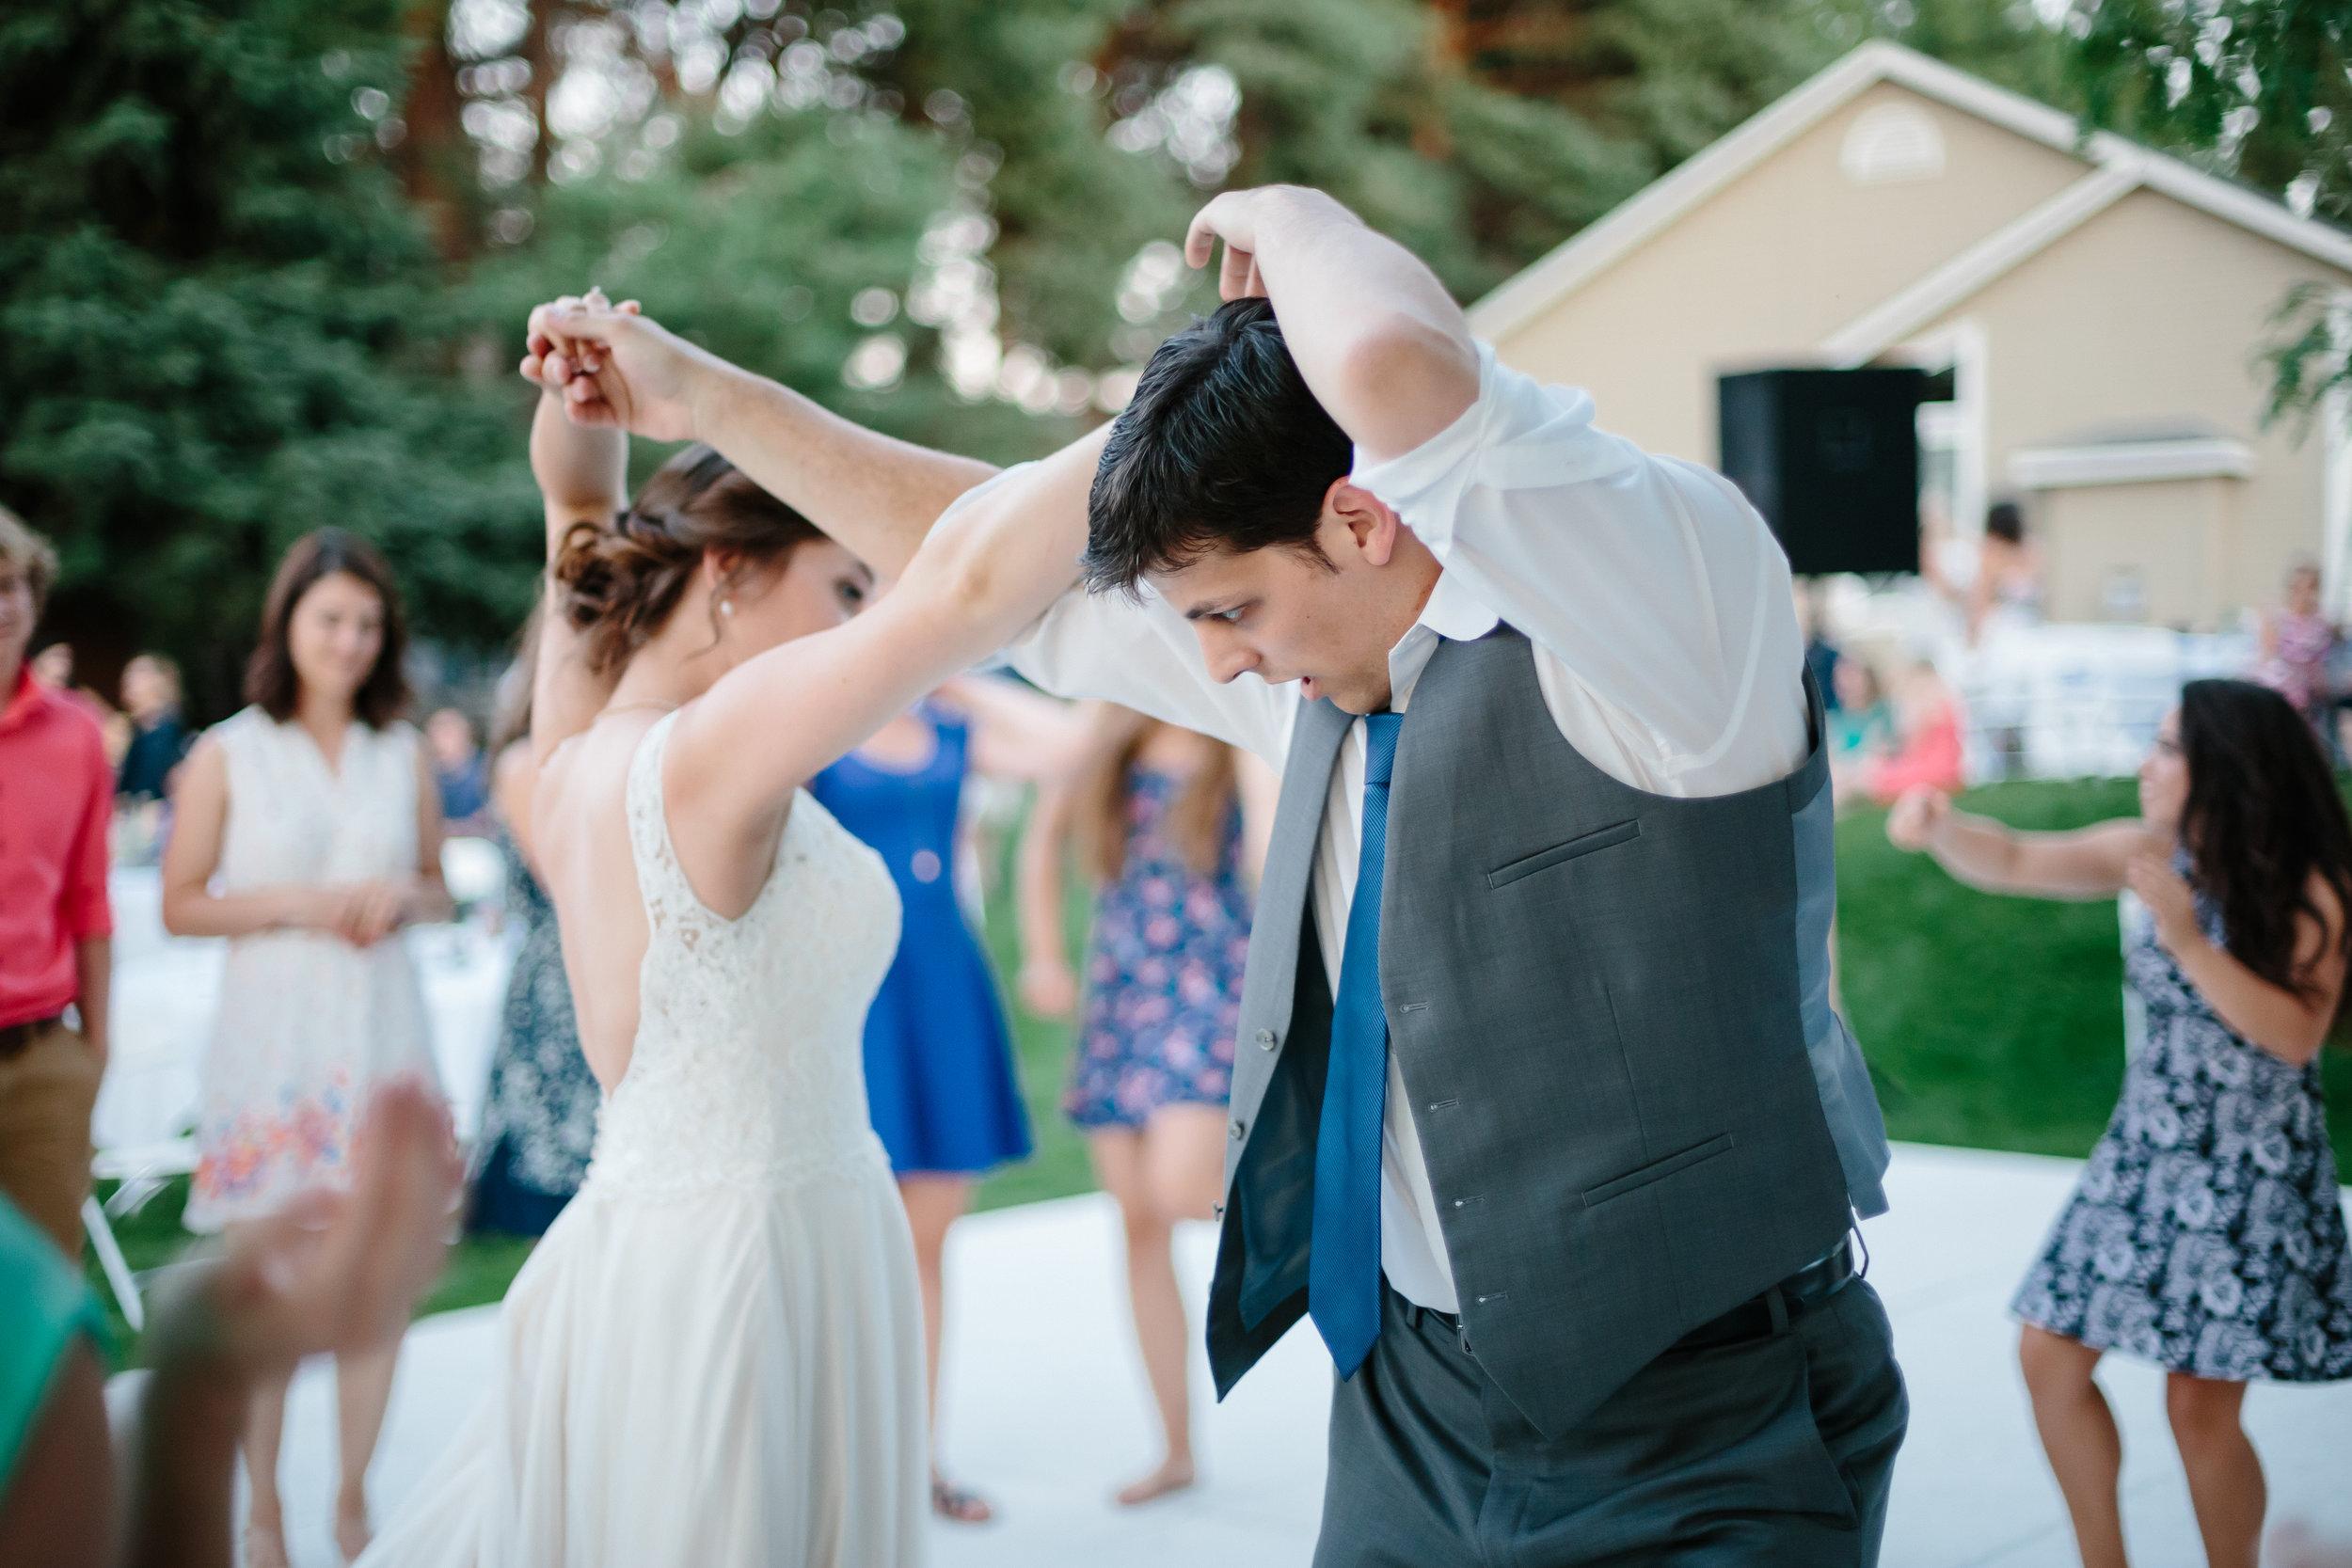 Jordan & Shantel Married - Idaho - Corrie Mick Photography-356.jpg